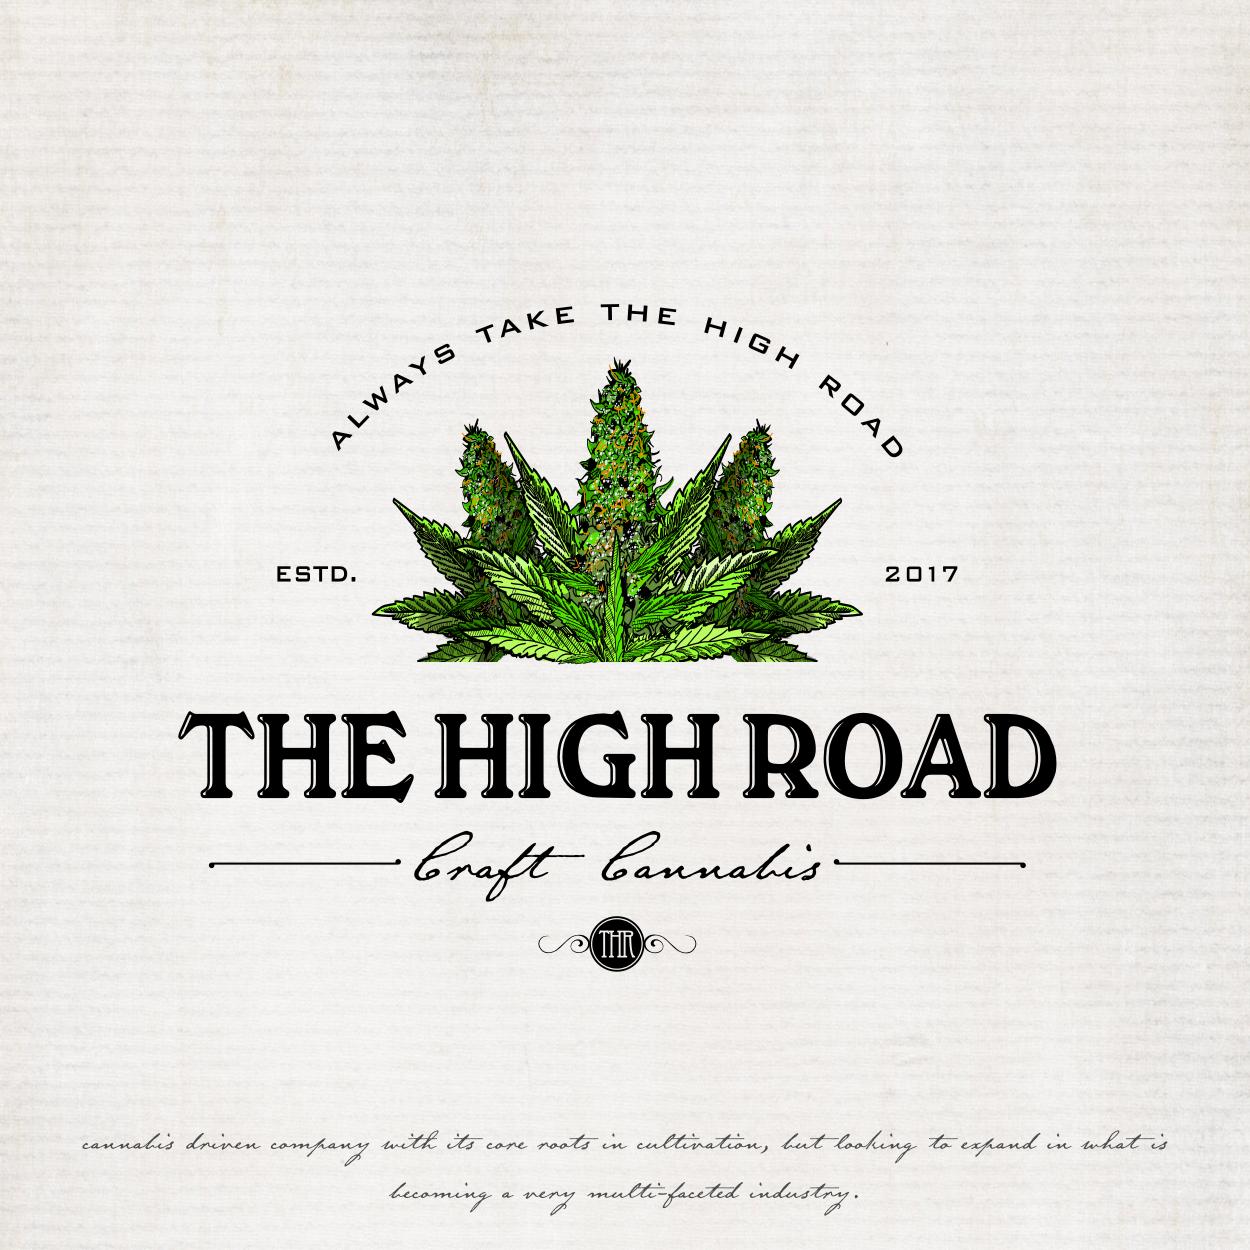 Cannabis logo design for The High Road